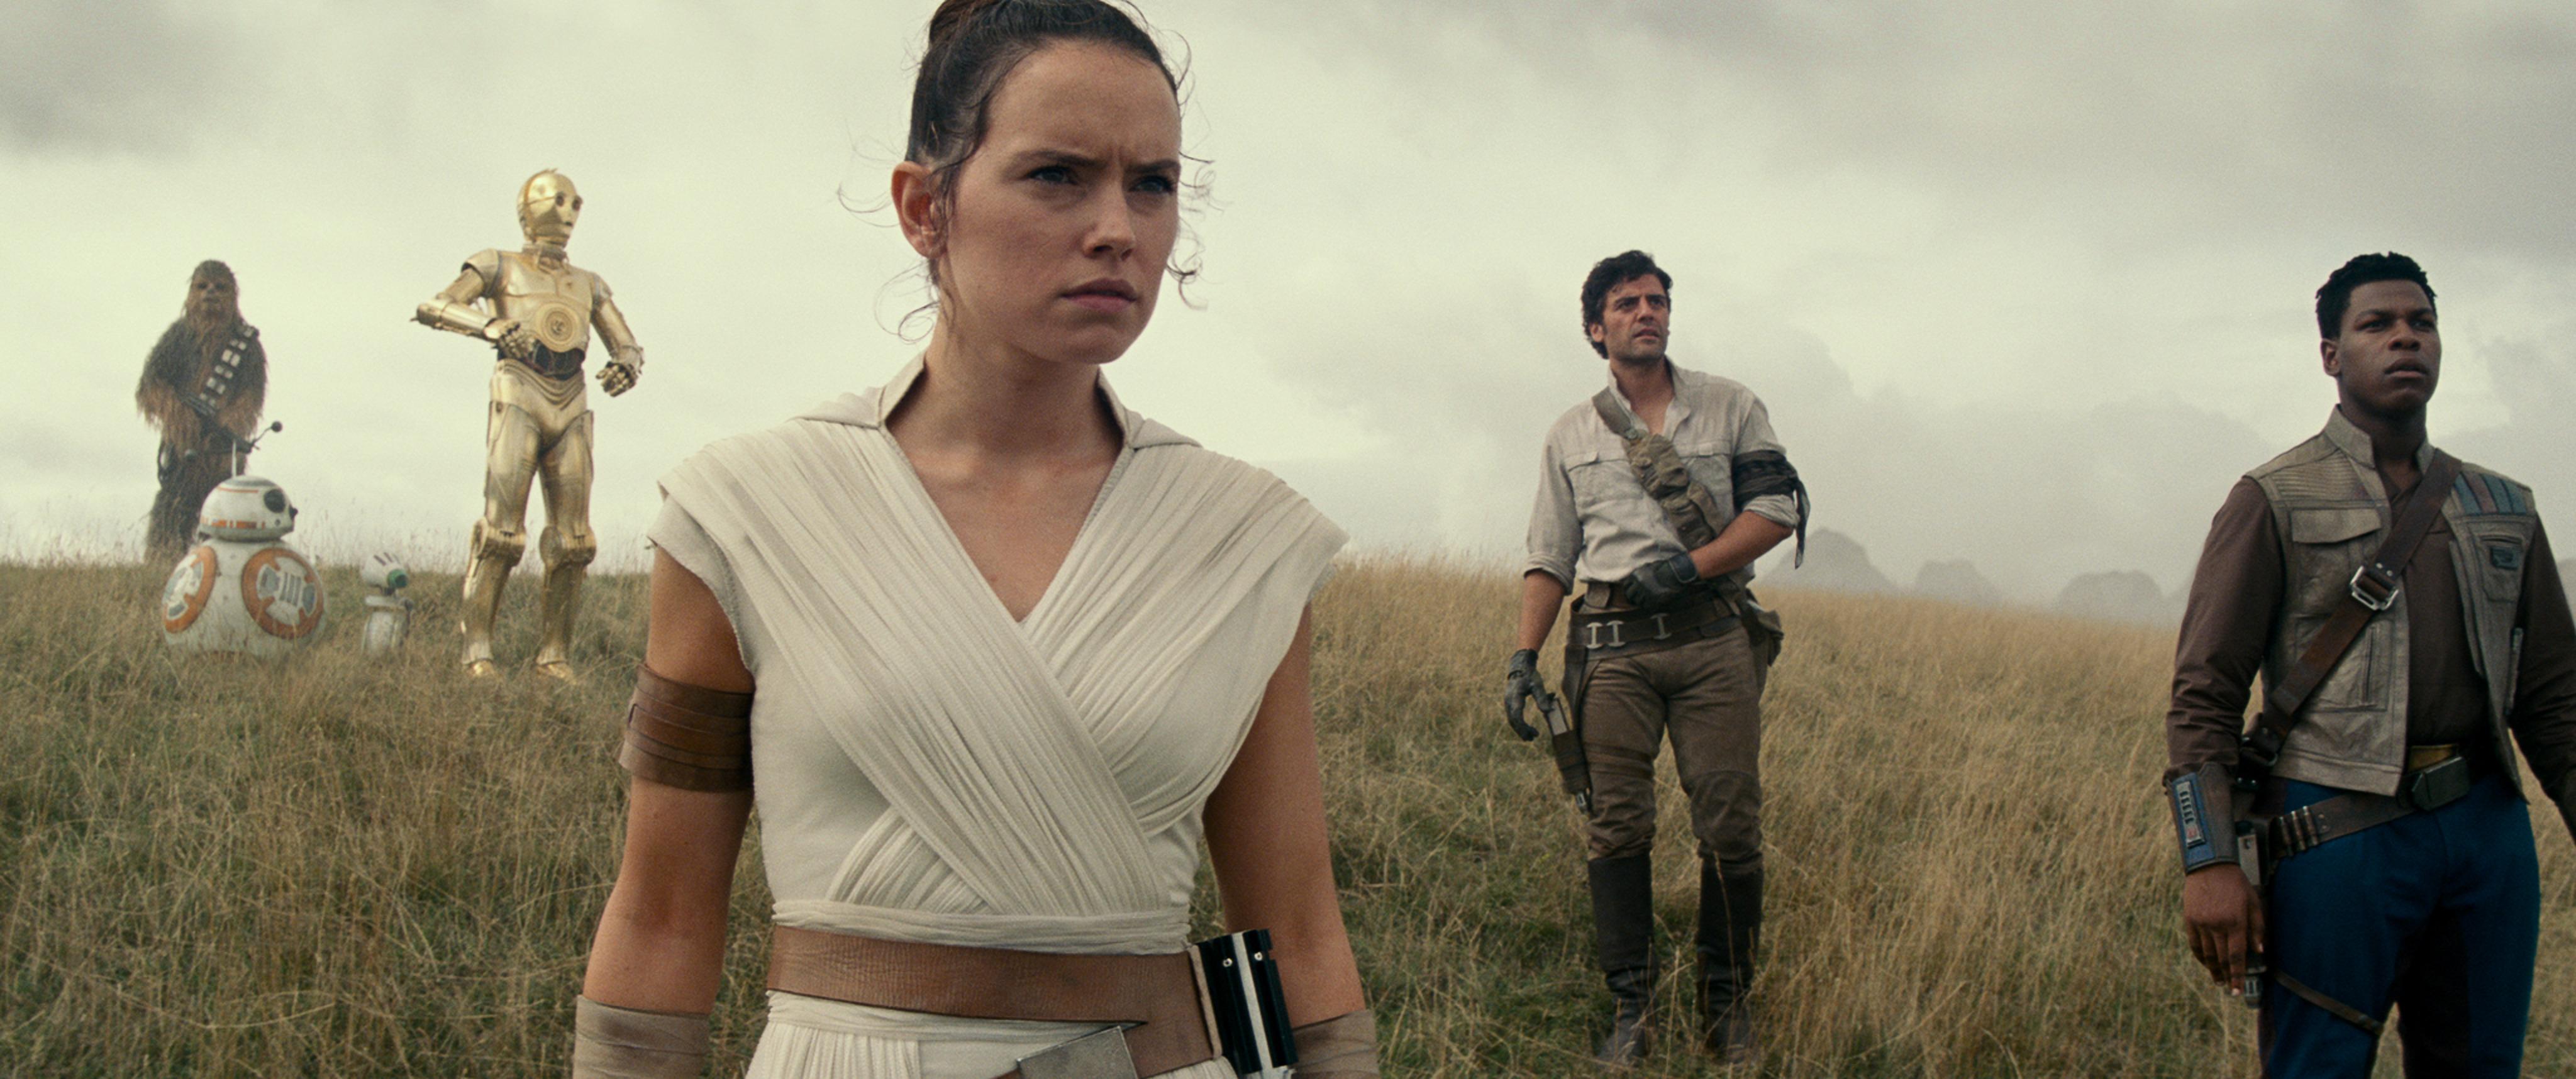 New Disney Star Wars Princess Leia Throw Blanket Title Crawl Episode IV New Hope